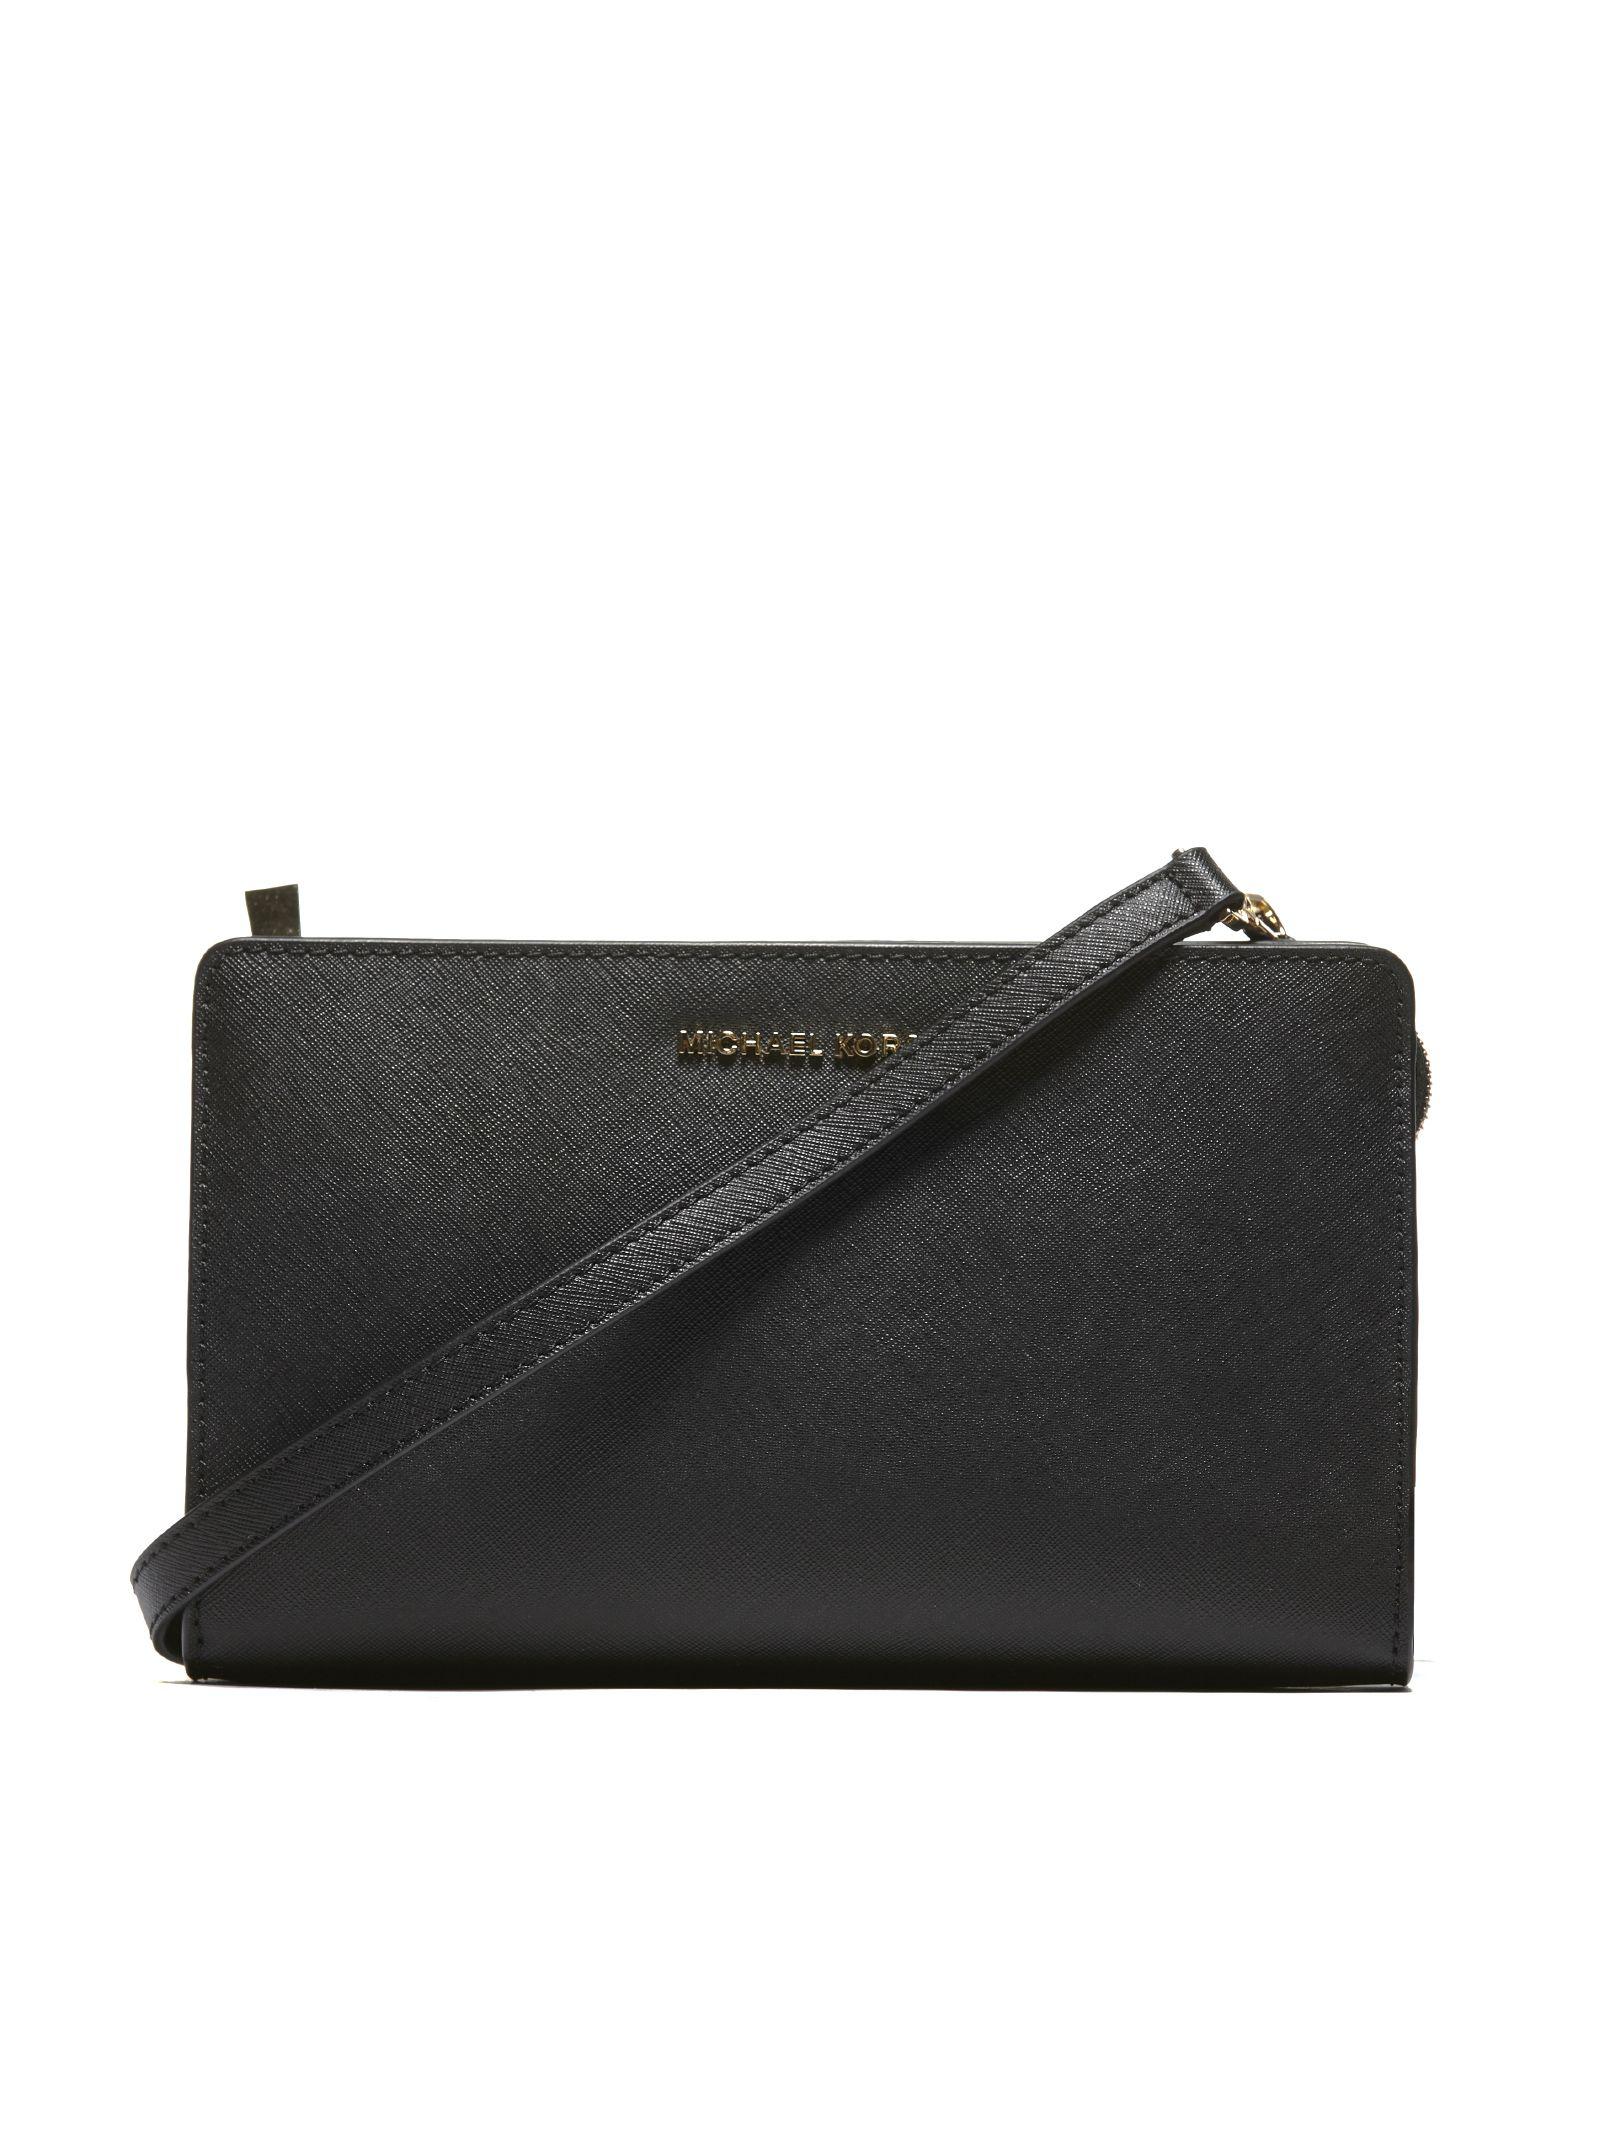 b68a410f35b2 Shop Michael Michael Kors Shoulder Bags on sale at the Marie Claire Edit